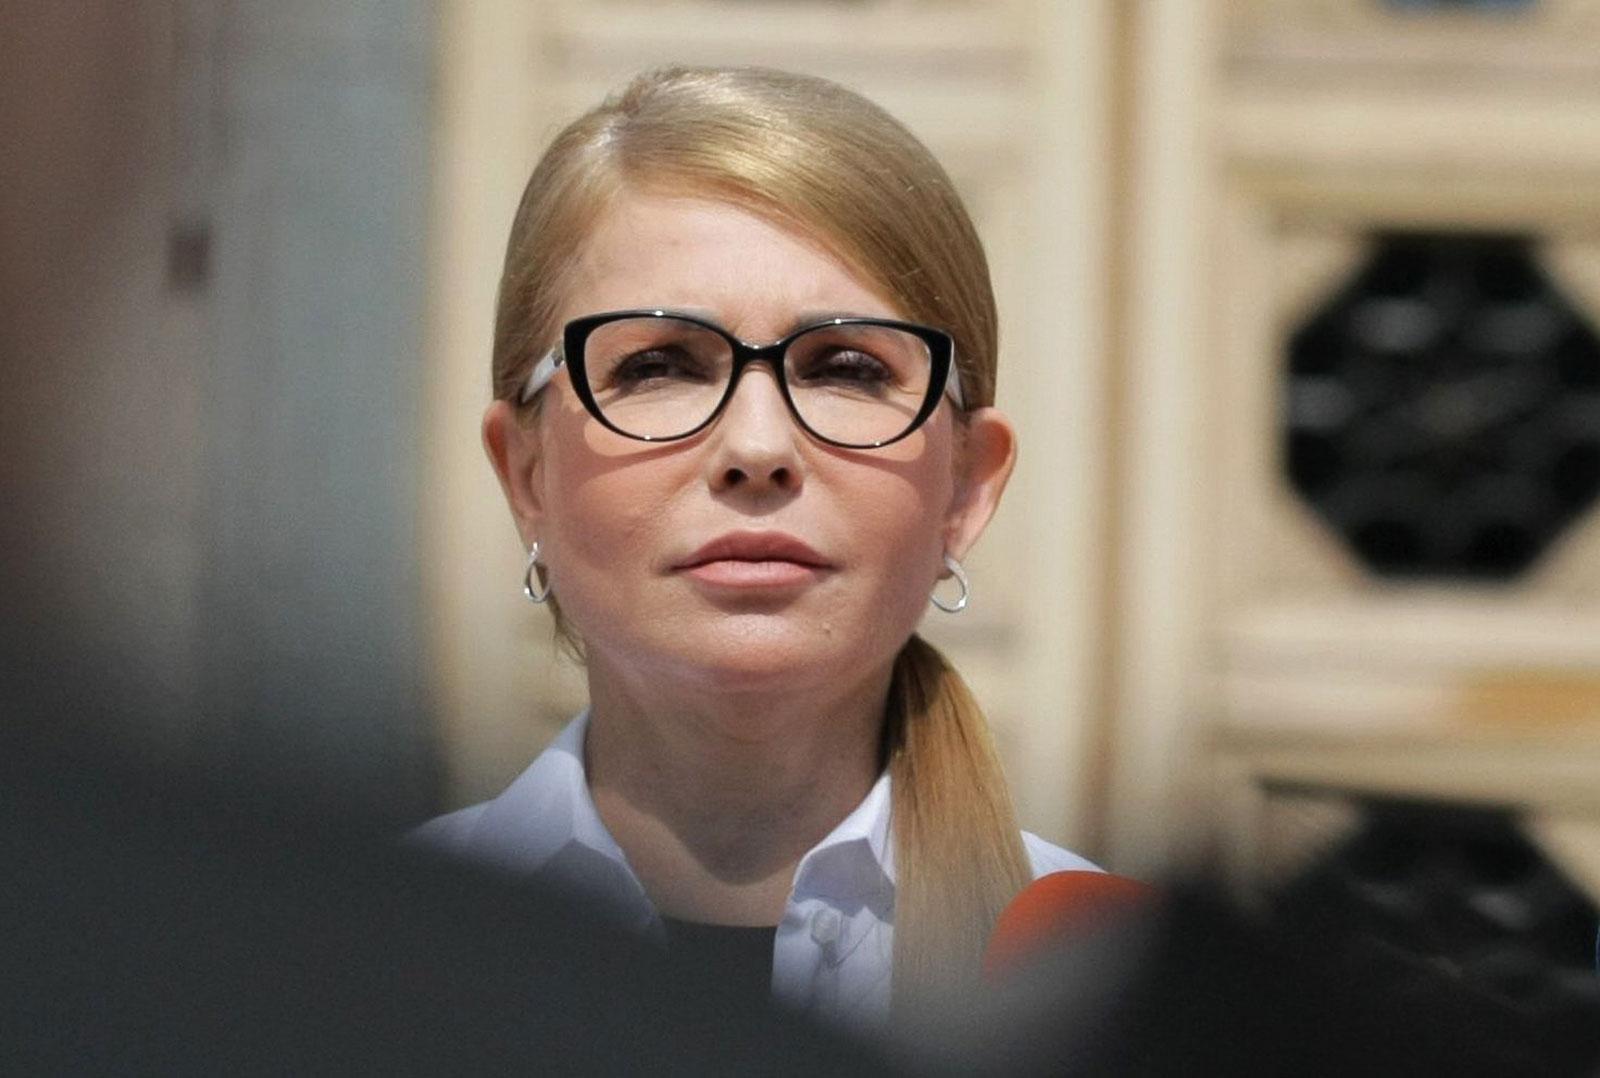 Yulia Tymoshenko attends a news conference in Kiev, Ukraine, on August 3.